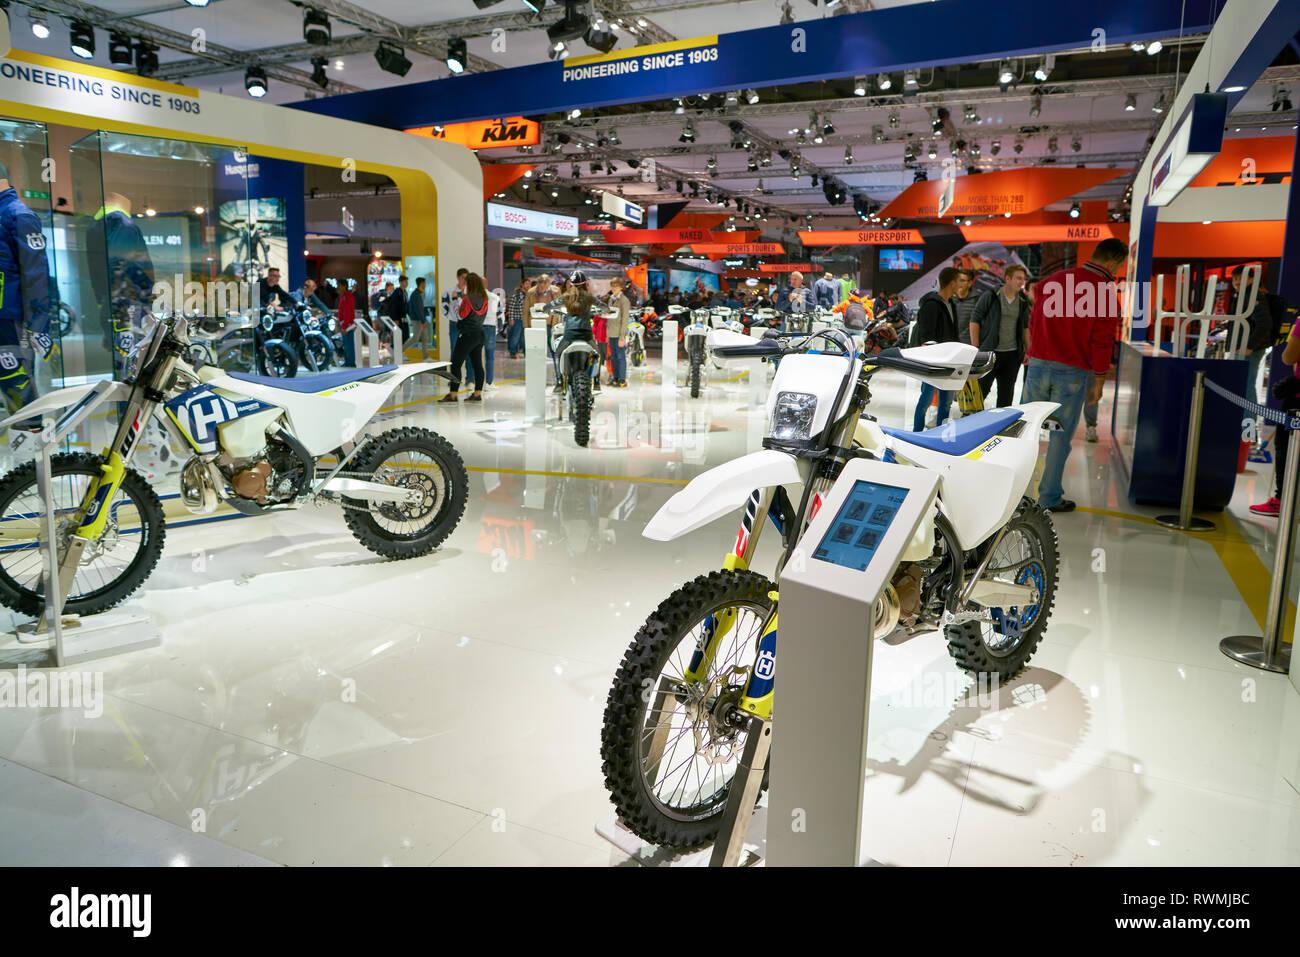 MILAN, ITALY - NOVEMBER 11, 2017: motorcycles on display at EICMA 2017 - 75th International Motorcycle Exhibition - Stock Image